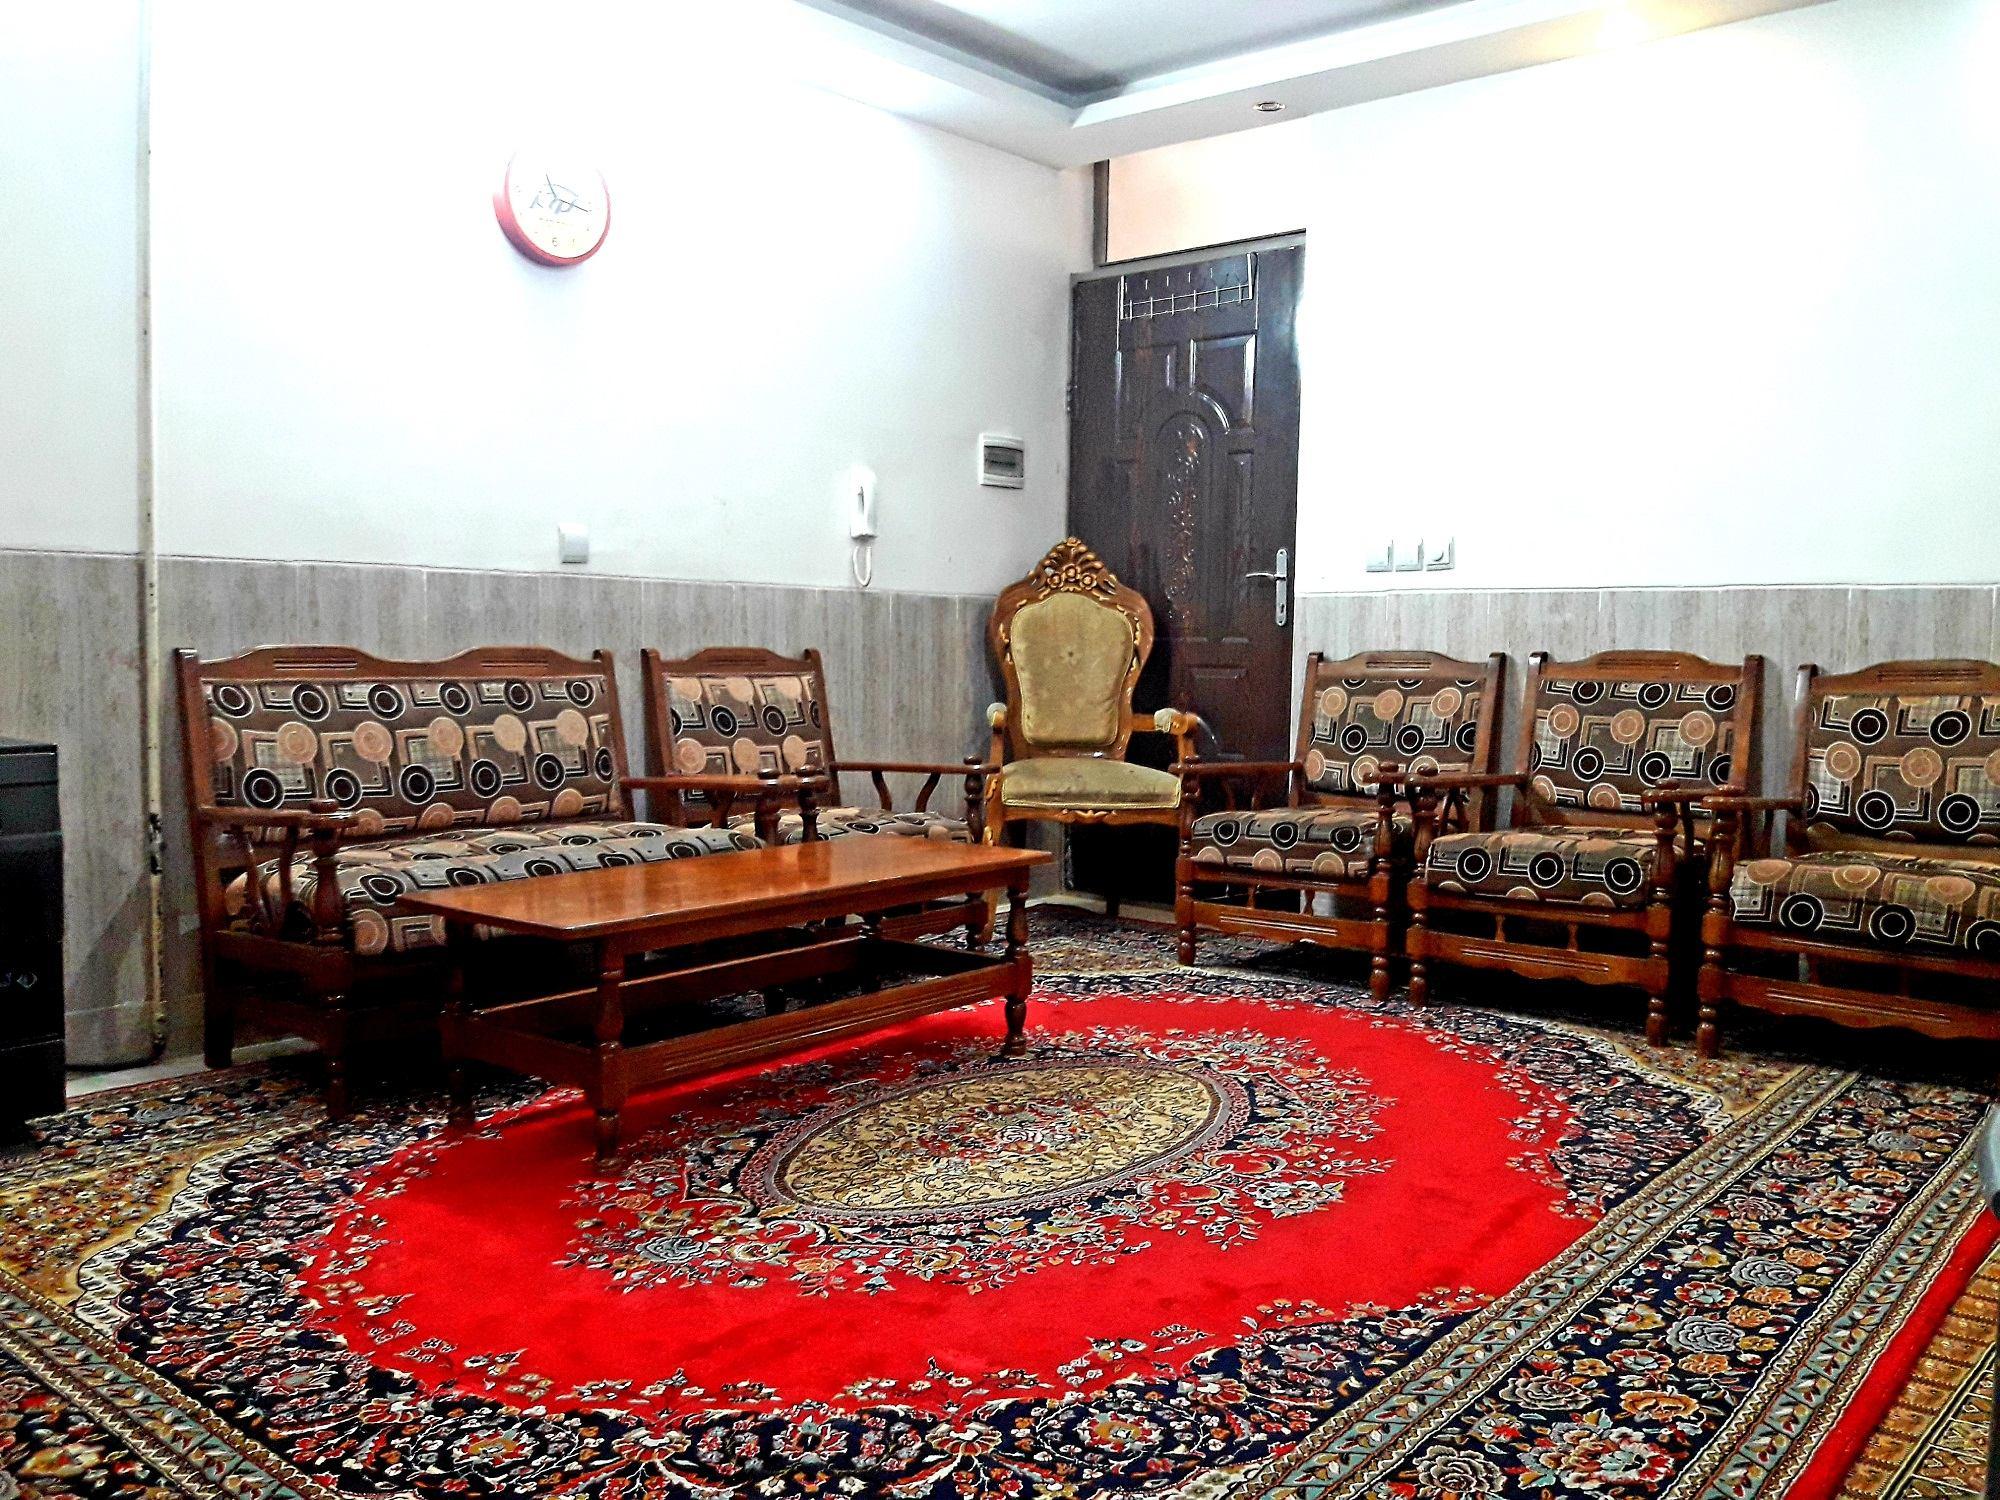 In town سوئیت مبله در لاله شمالی اصفهان